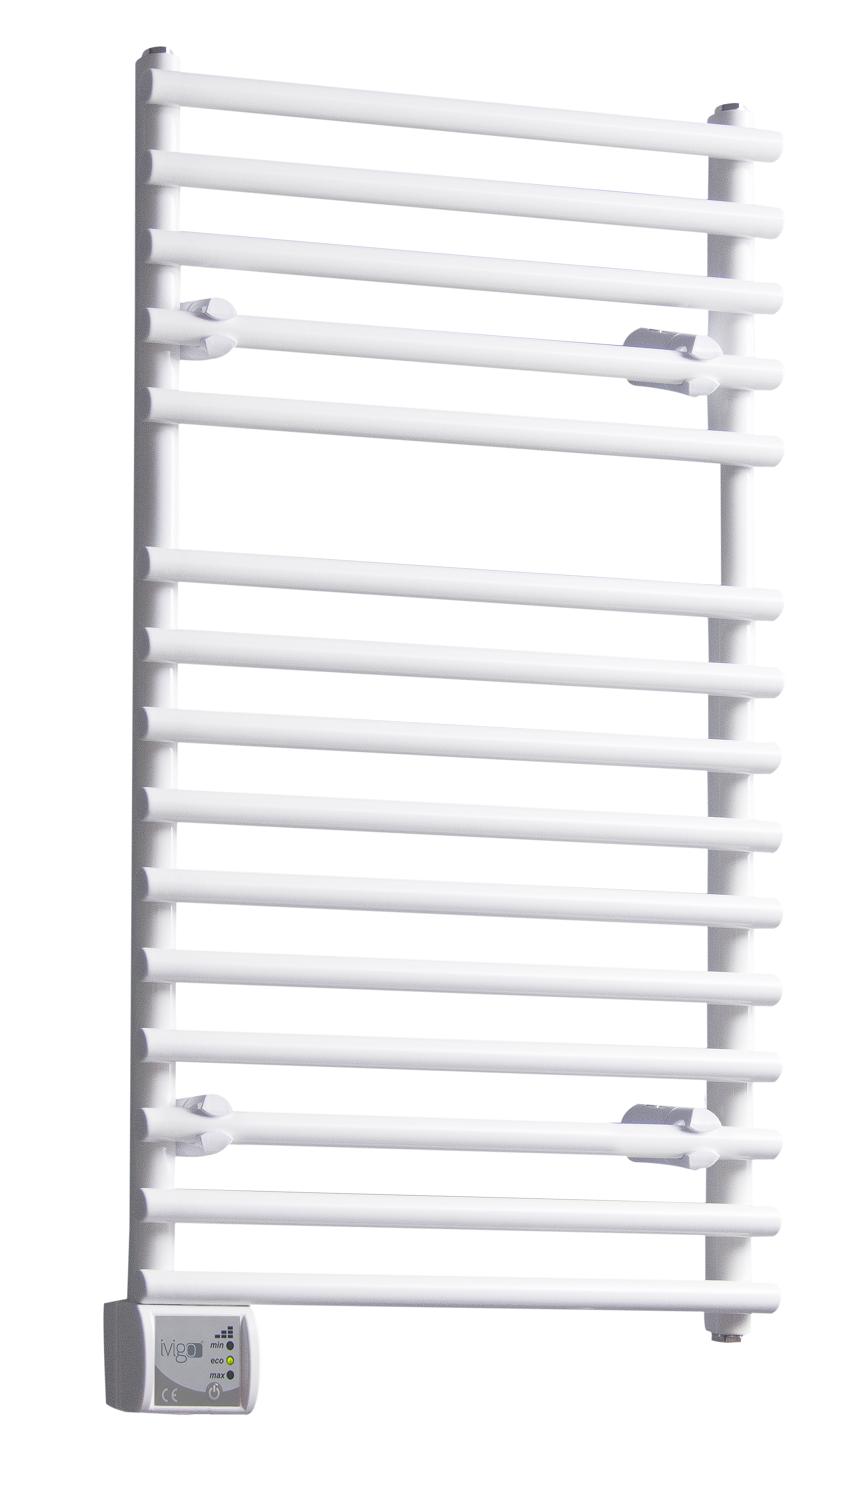 Radiator (calorifer) baie portprosop electric iVigo EHR 5015, 350 W, 500x800 mm, culoare alb fornello imagine